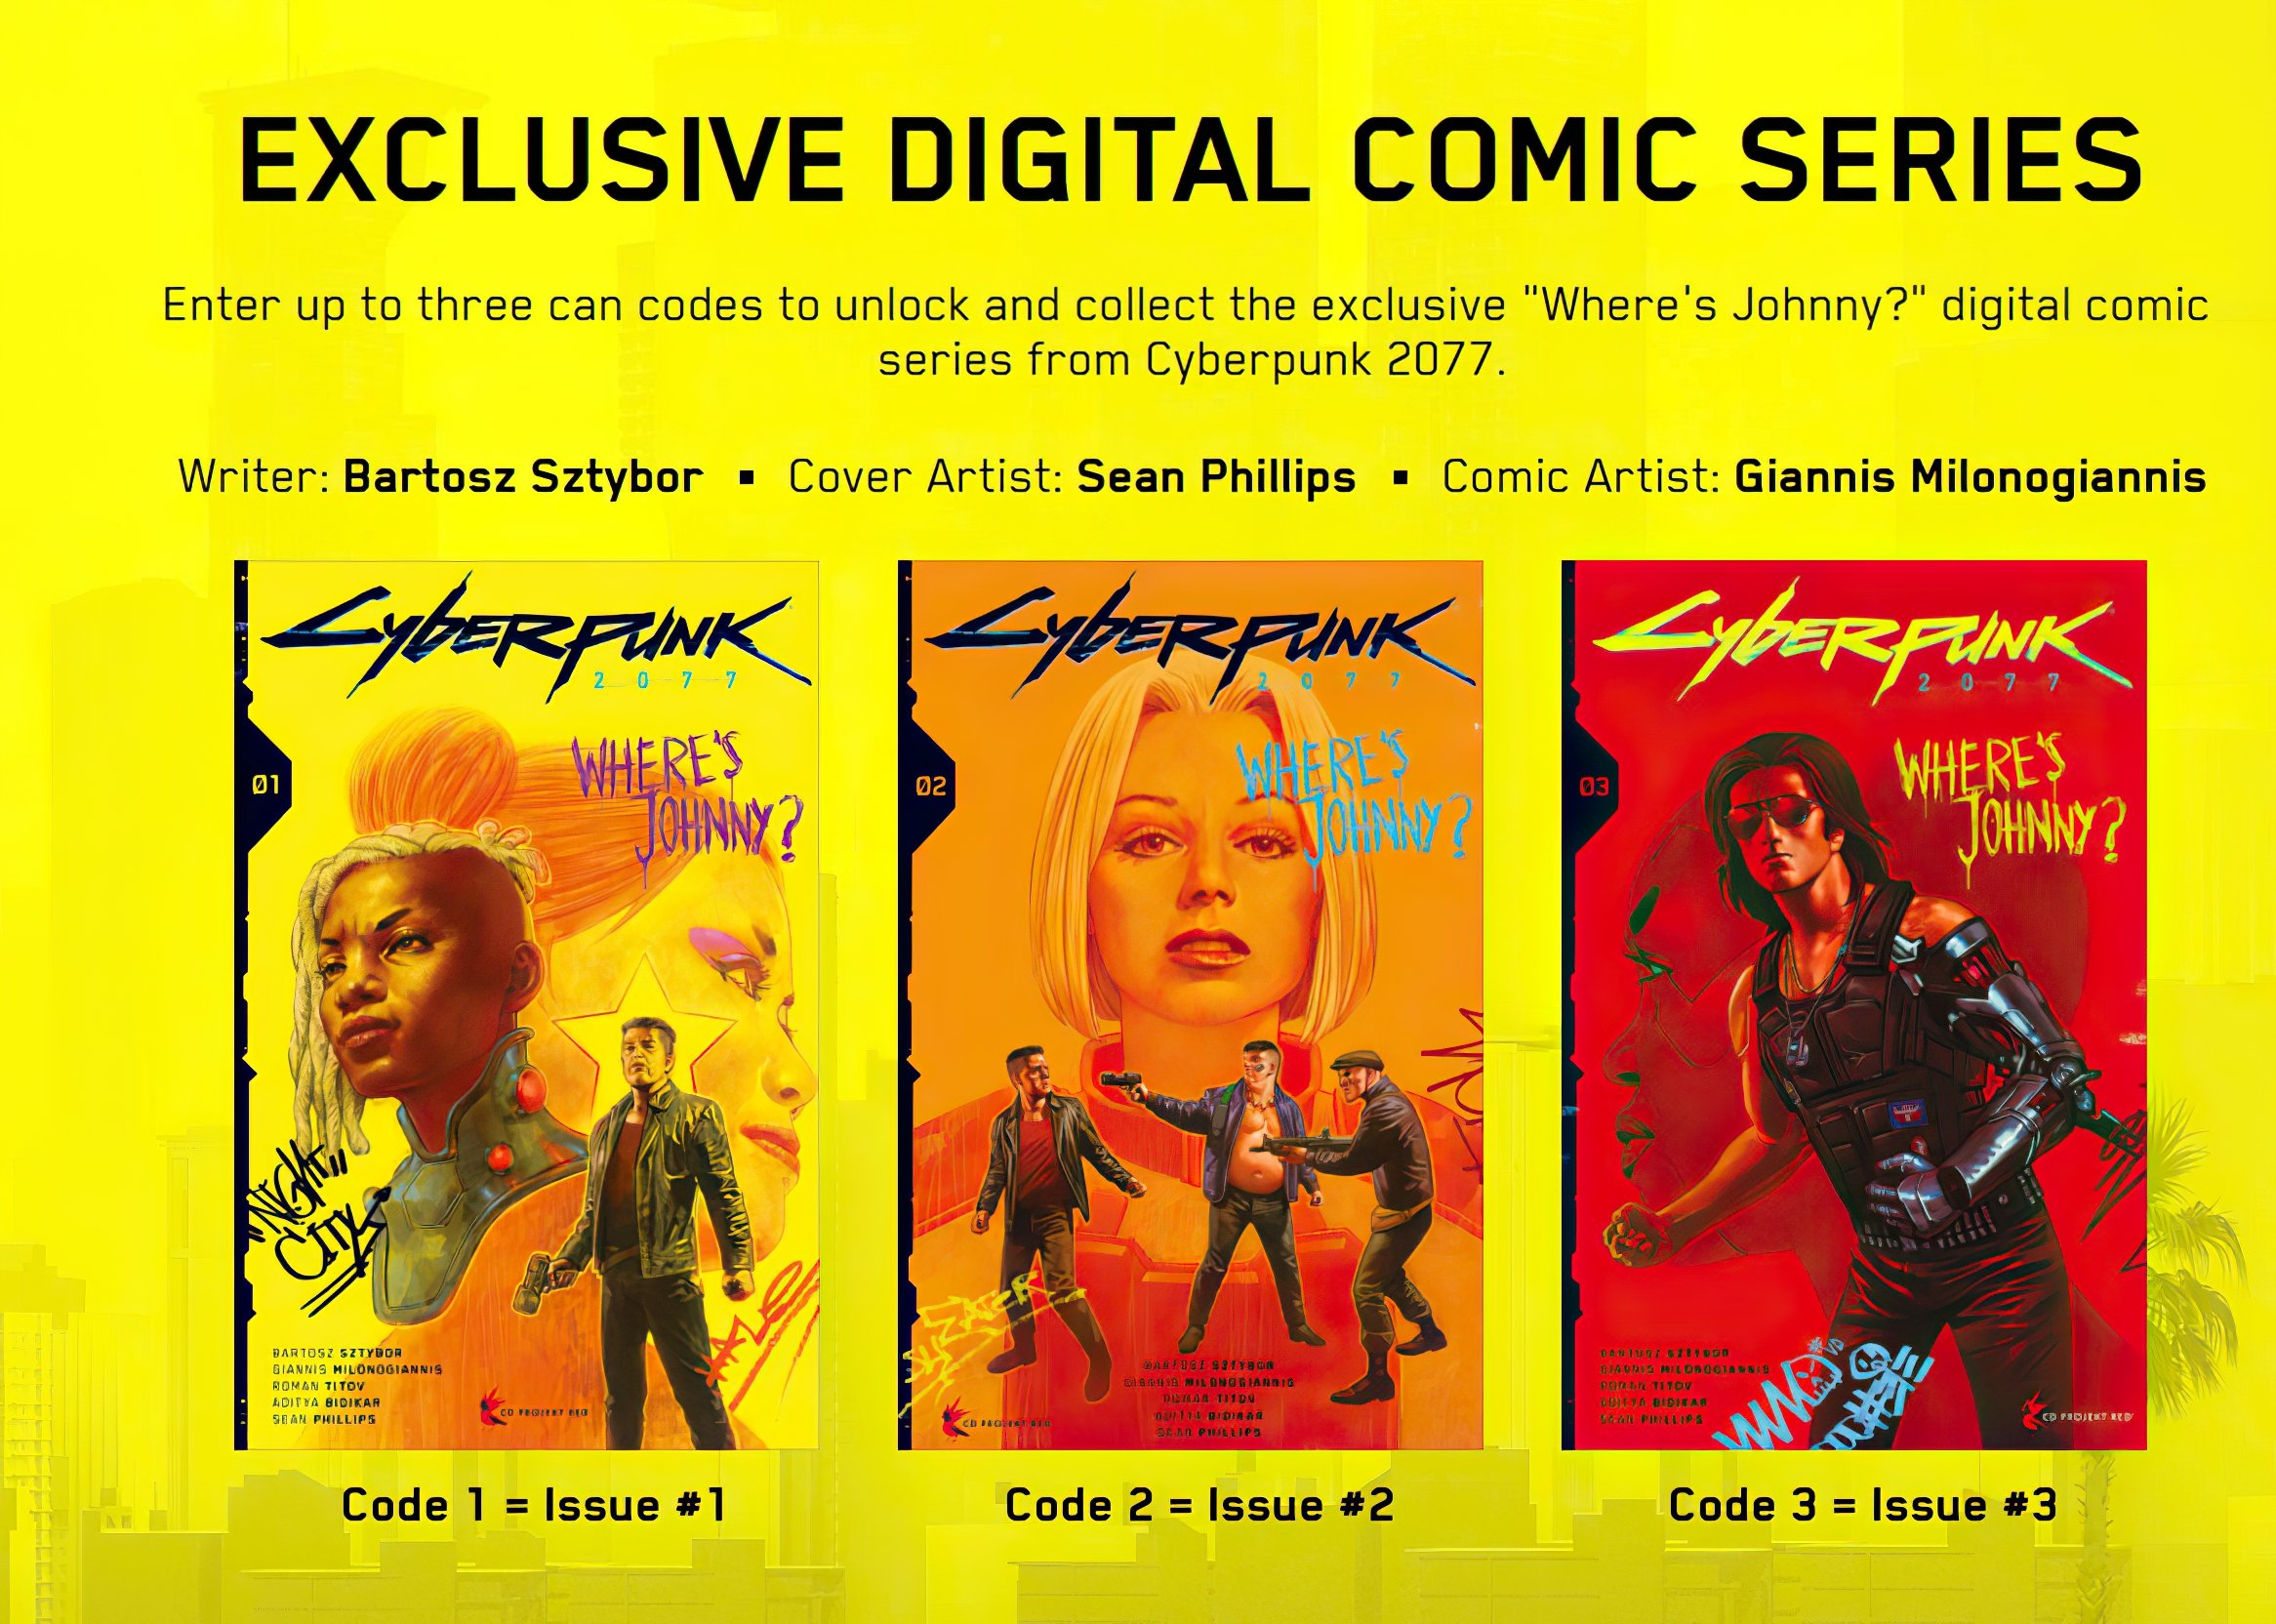 Cyberpunk 2077: Where's Johnny?